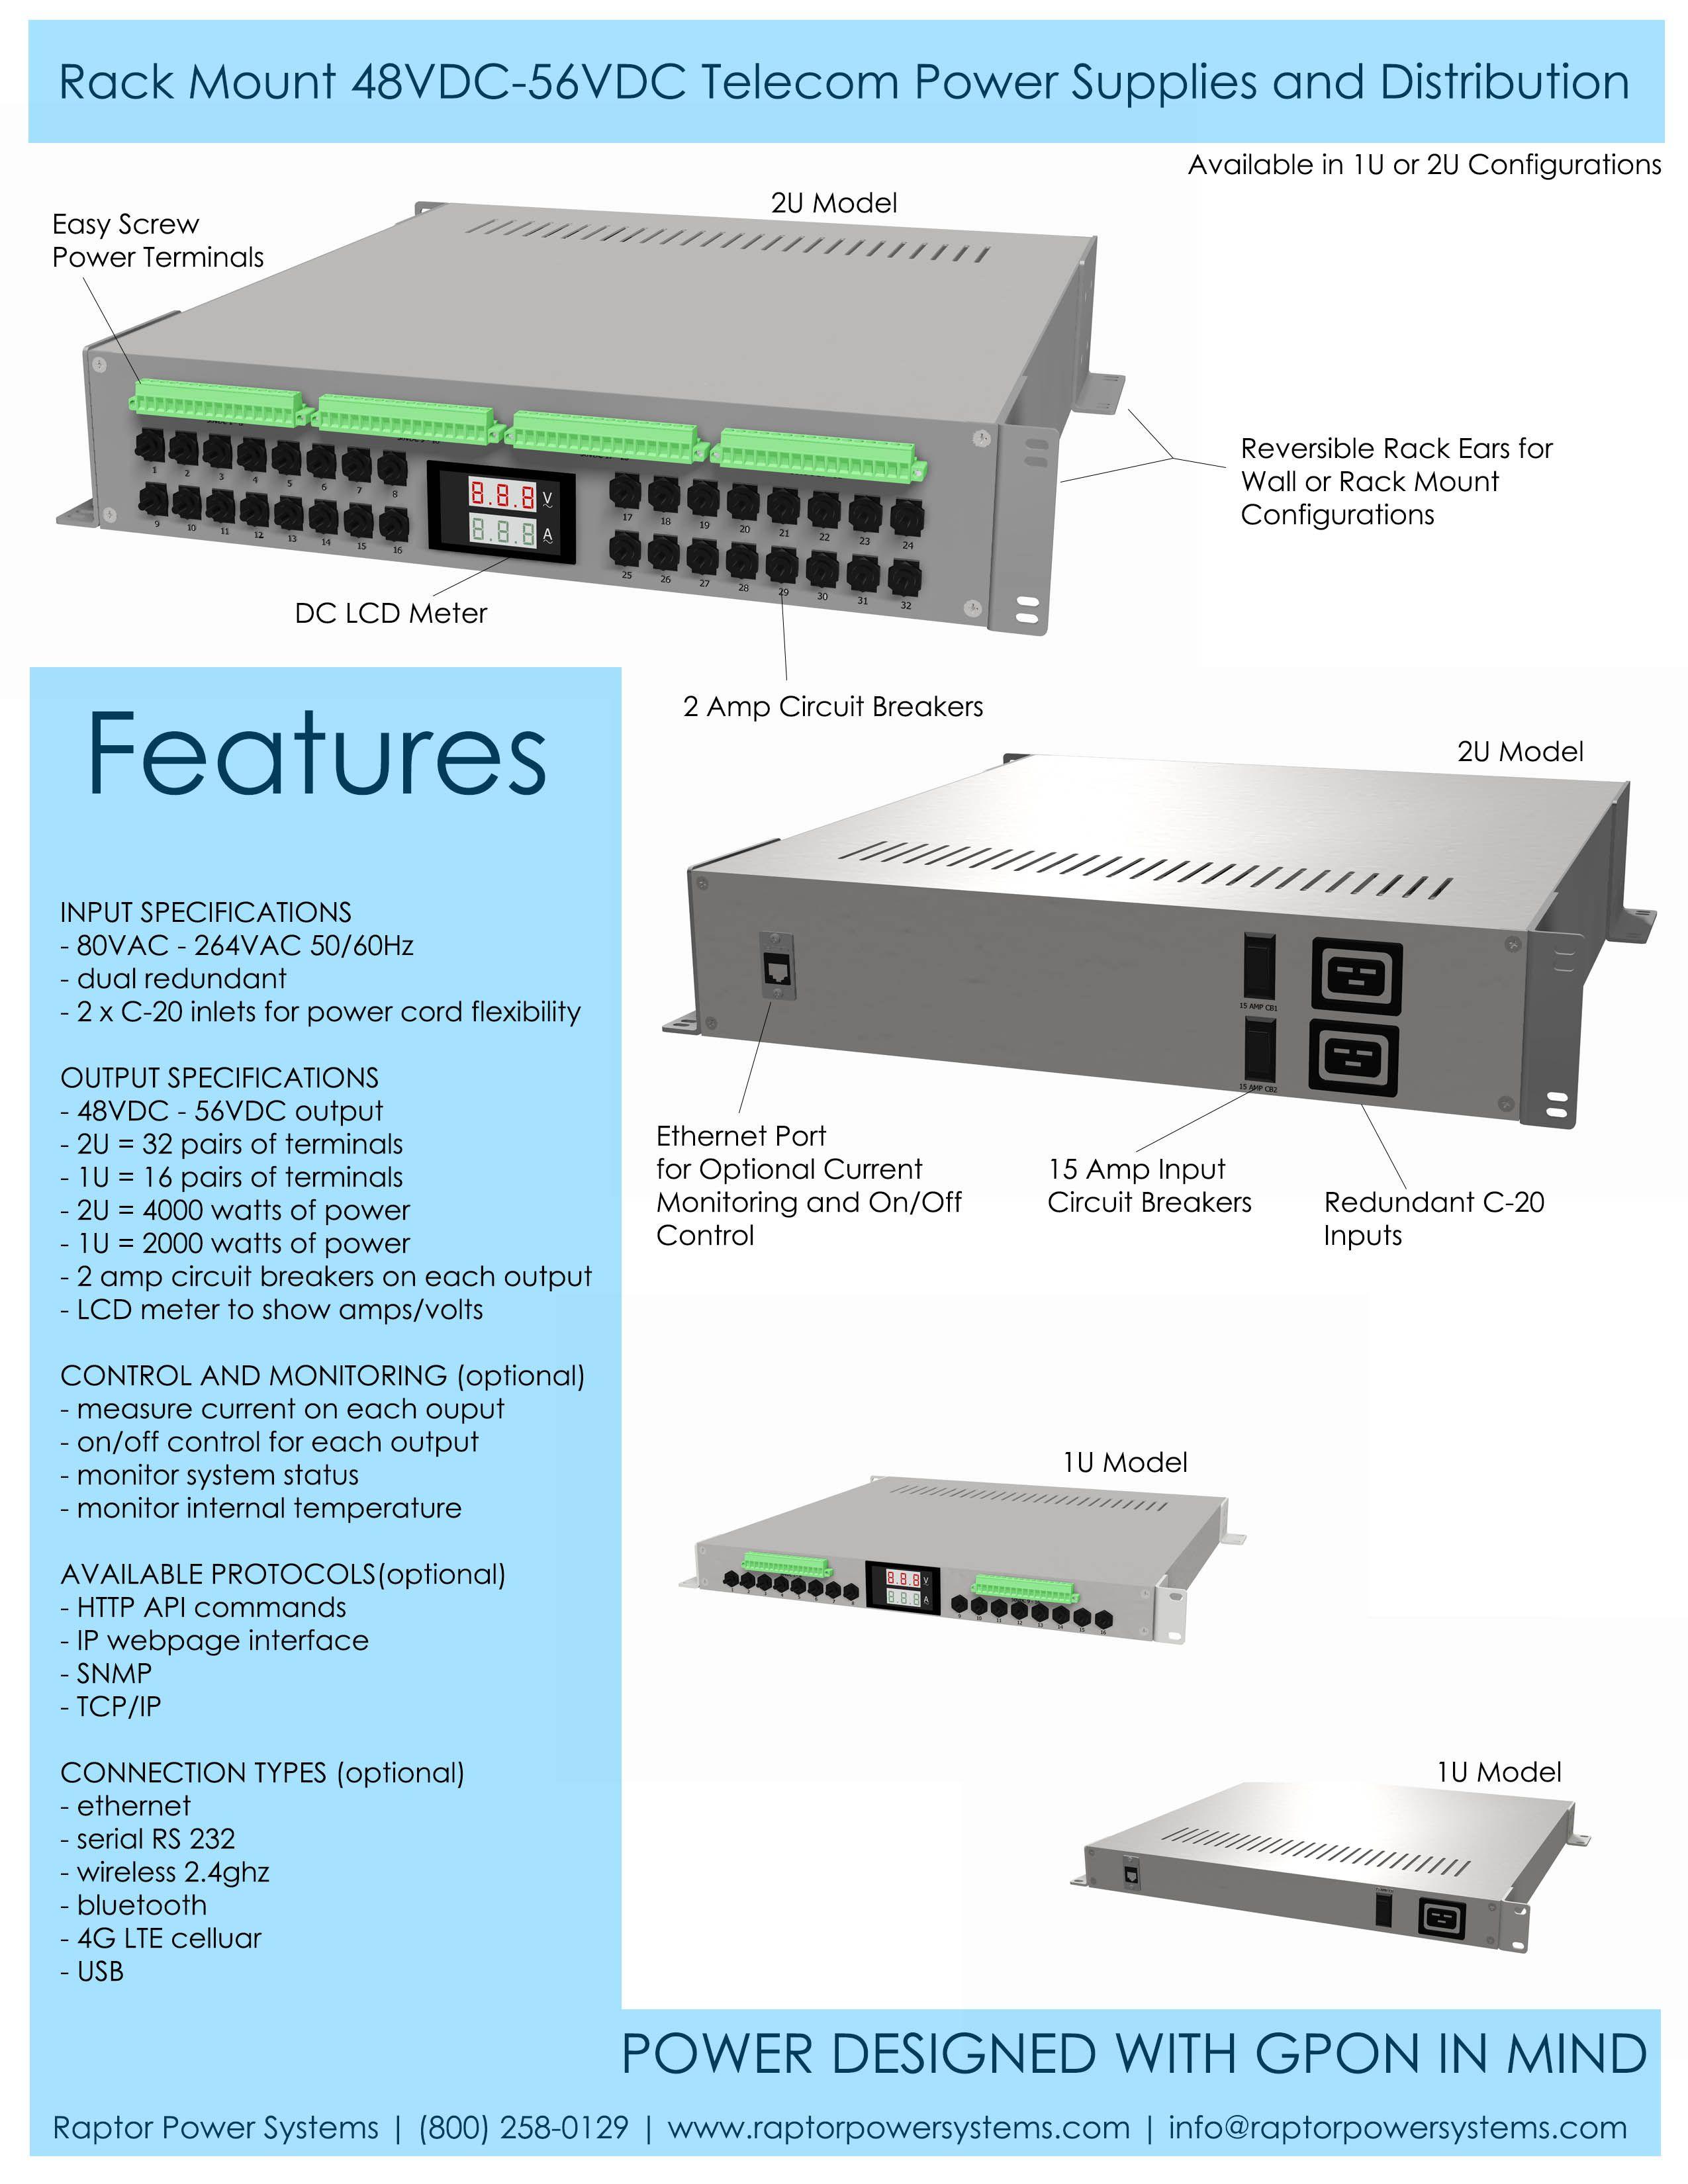 Telecom Power Supply 48v Gpon 2 Raptor Systems Custom Snmp Wiring Diagram Supplies The Unit